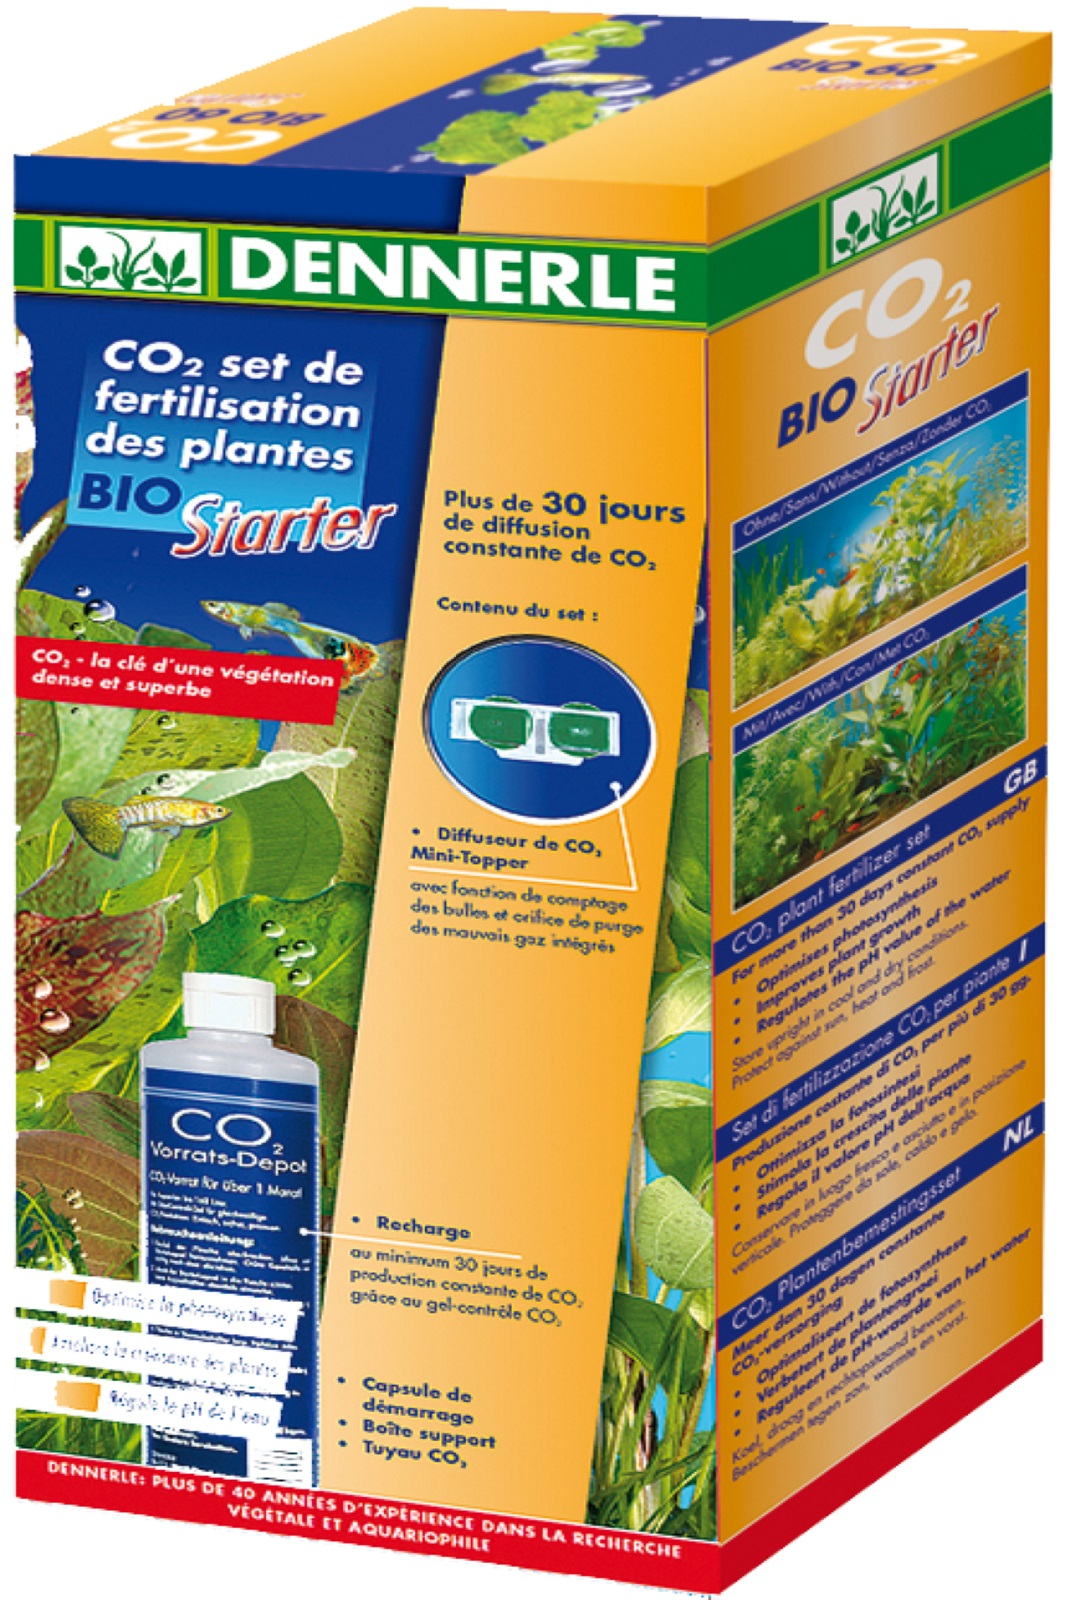 CO2 Pflanzen Dünger Set BIO Starter